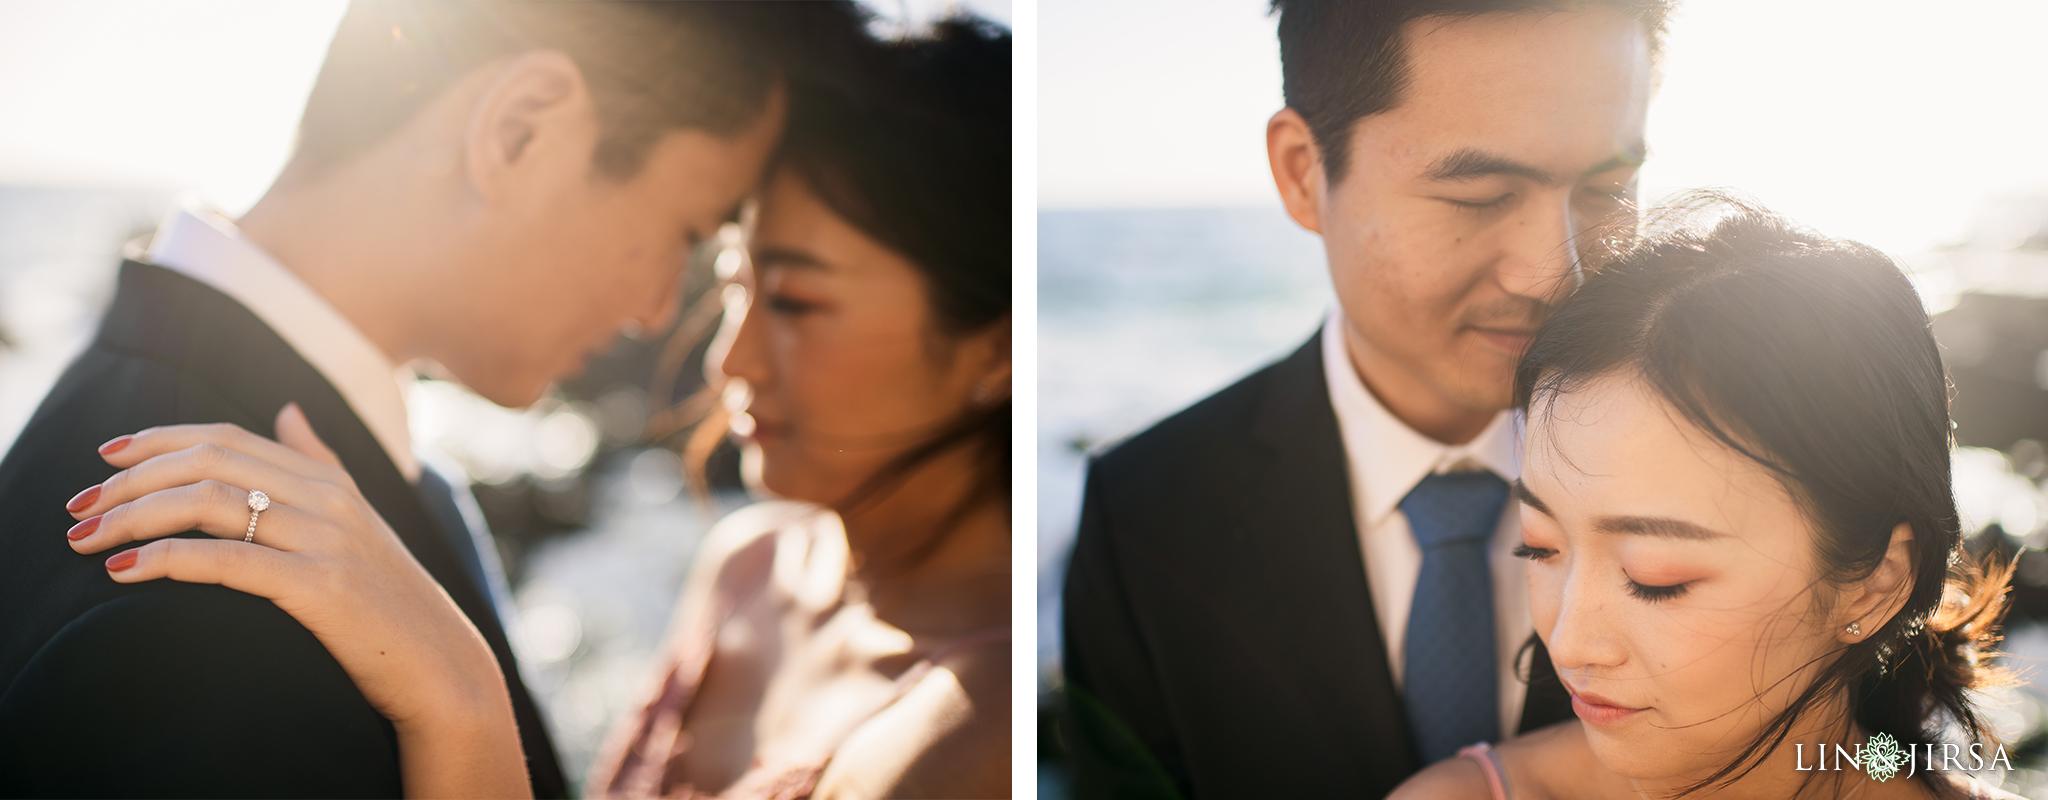 07 Laguna Beach Orange County Engagement Photography